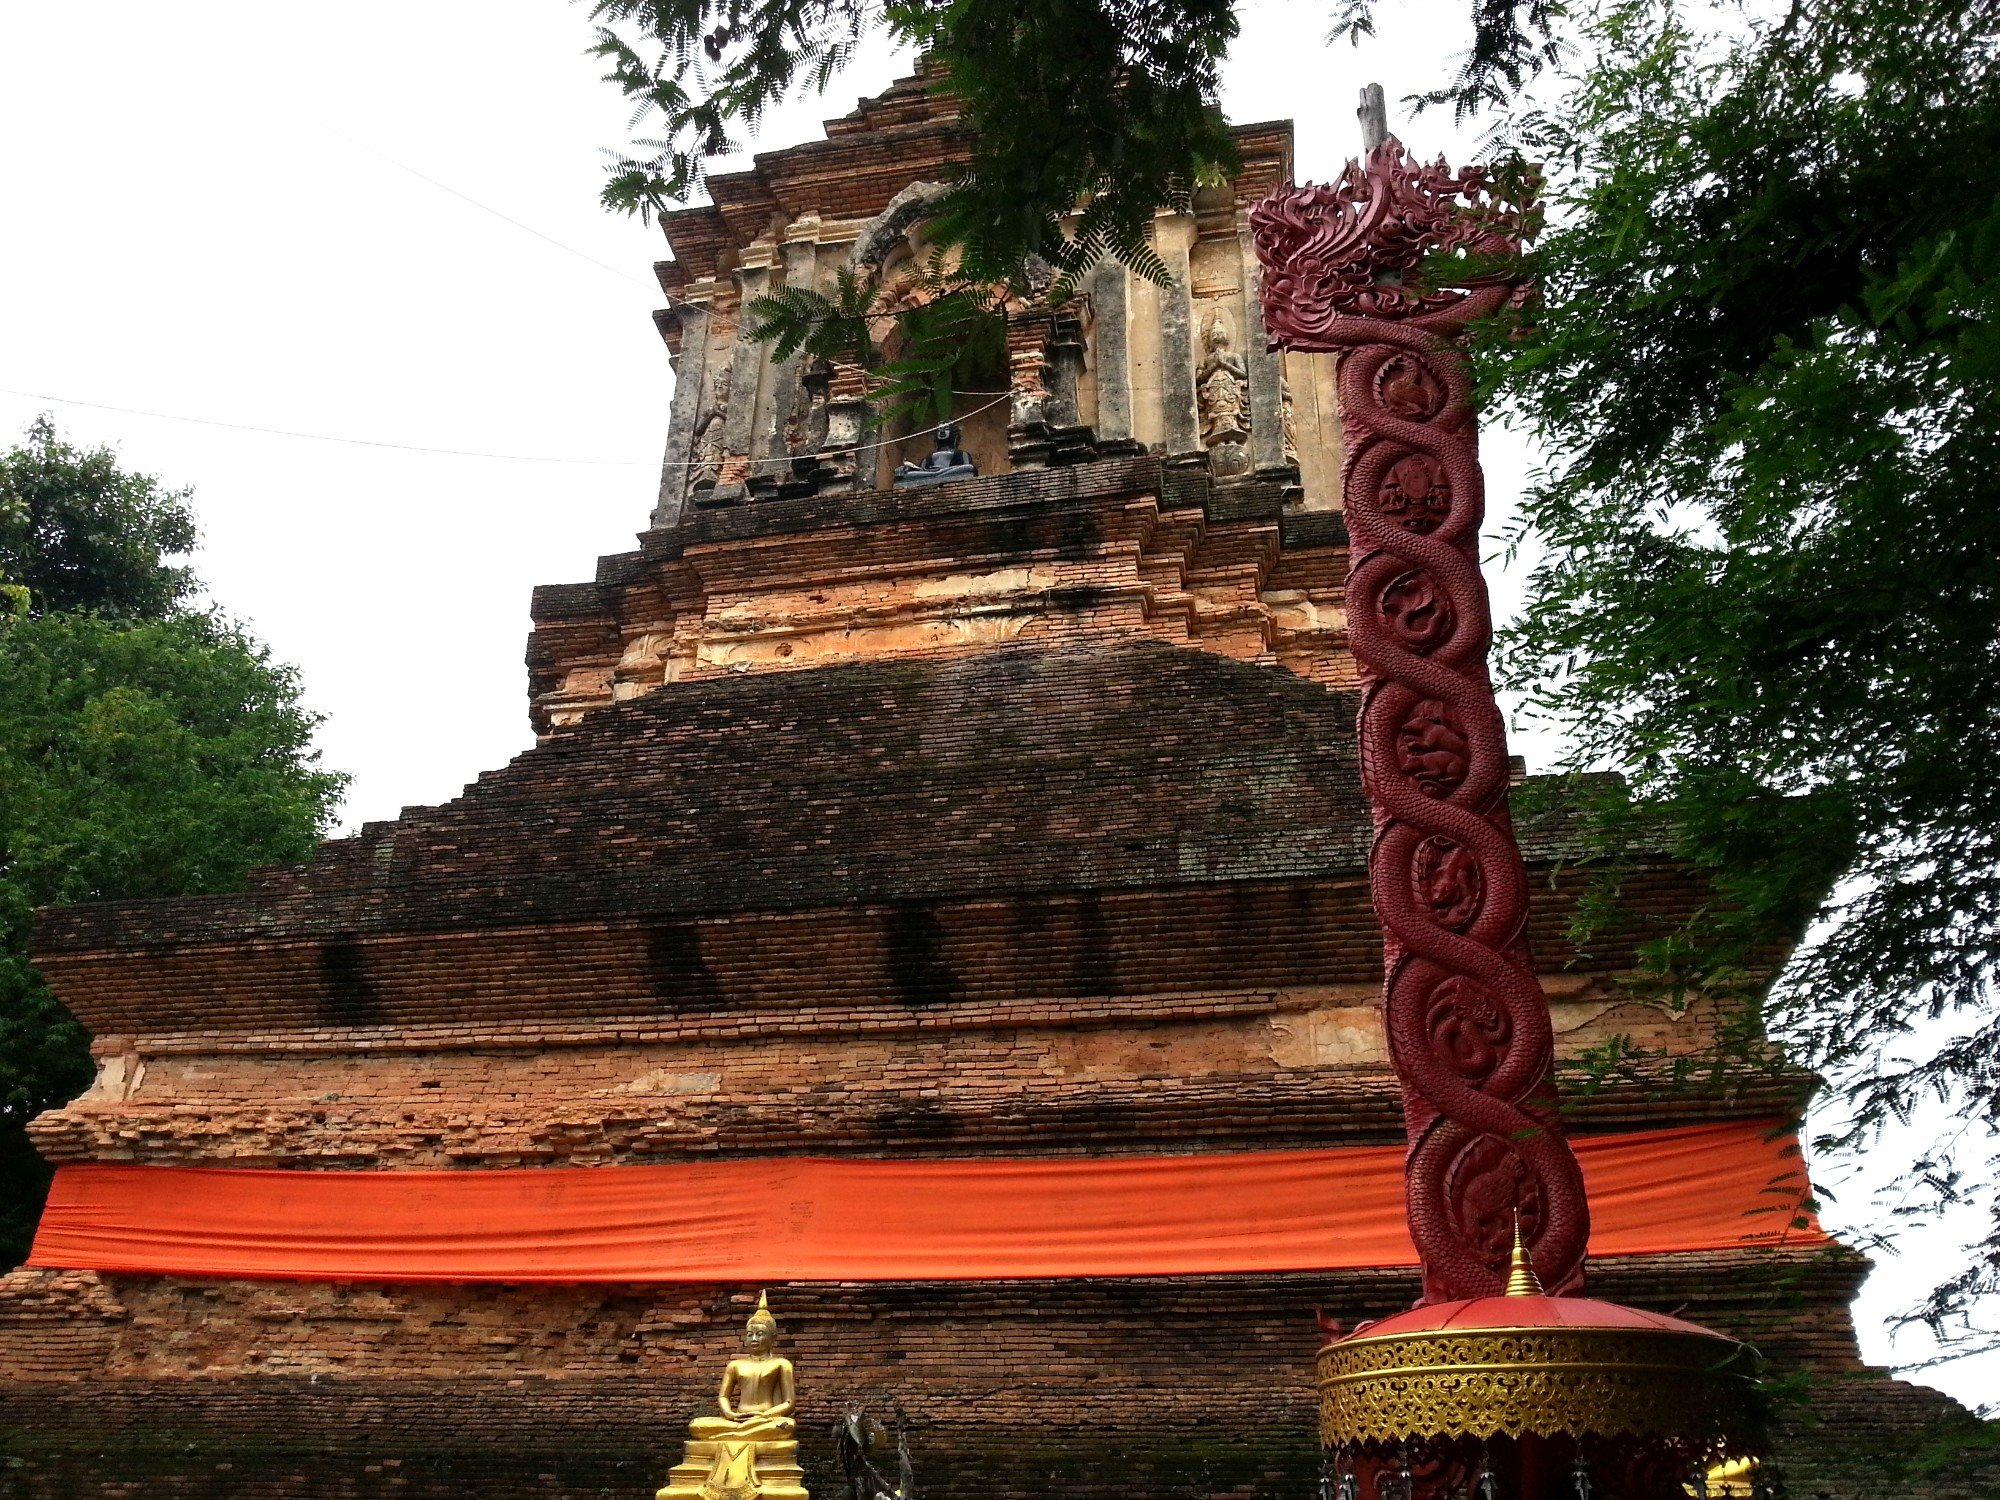 Decoration on the chedi at Wat Lok Moli